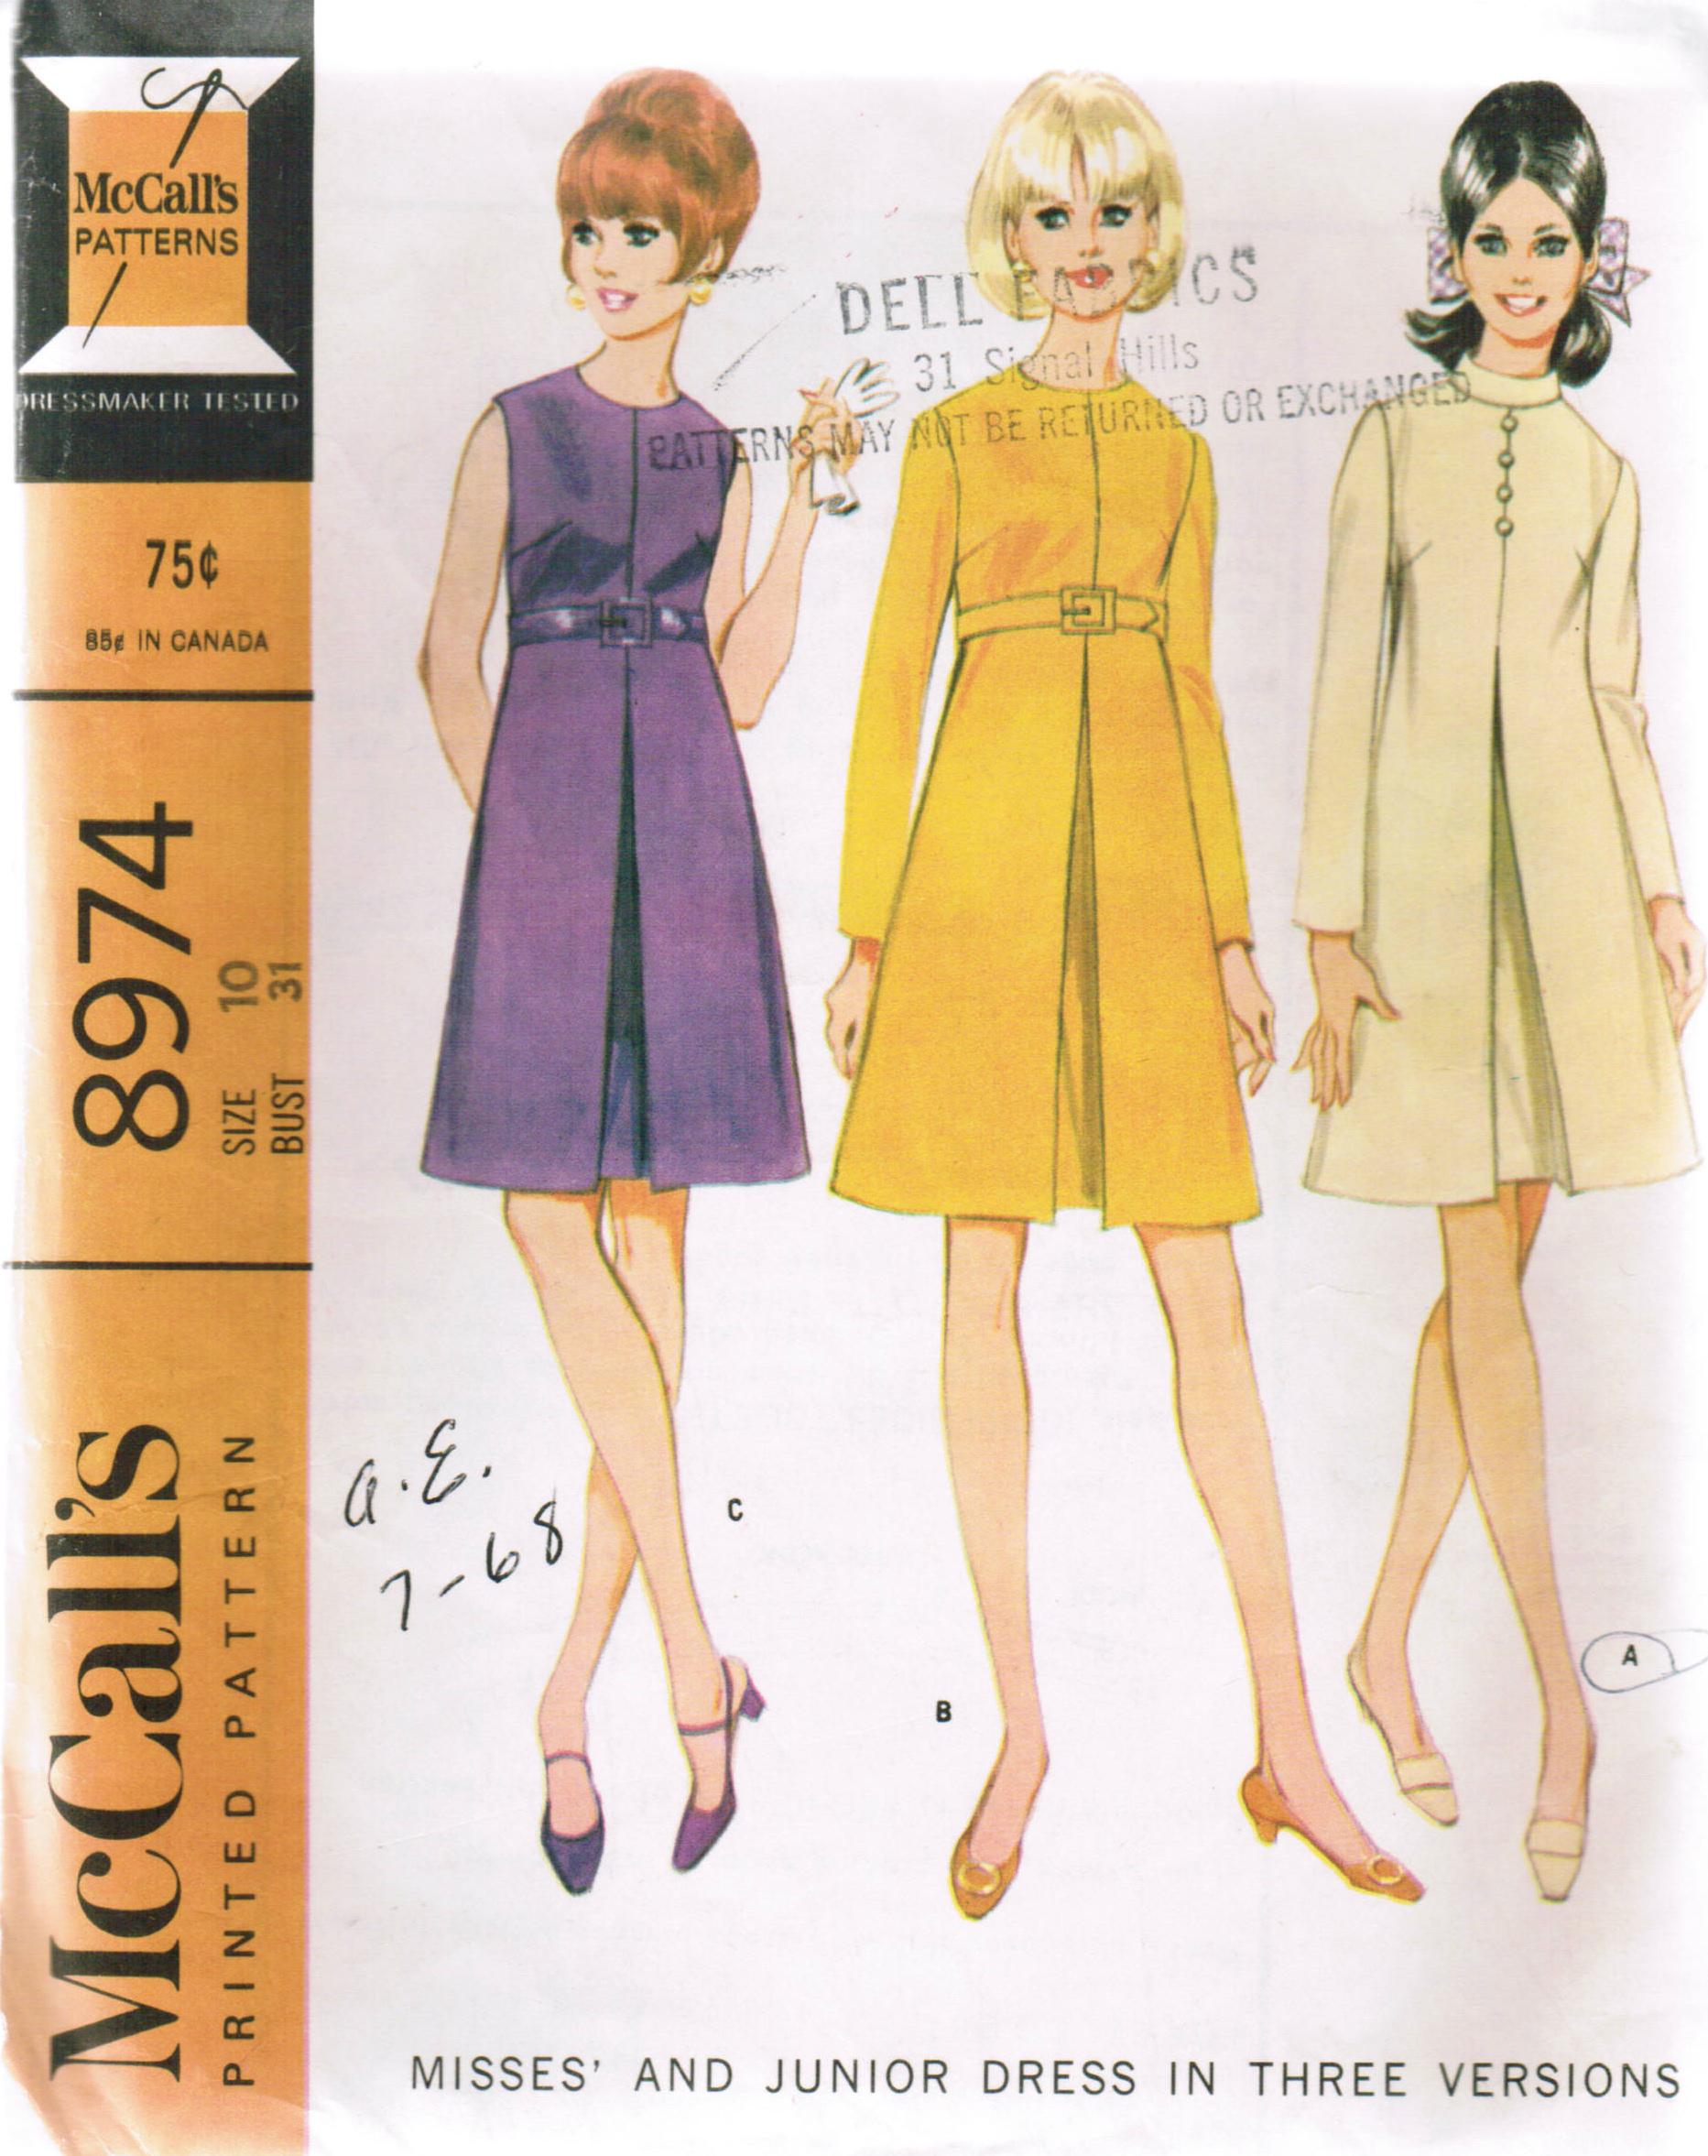 McCall's 8974